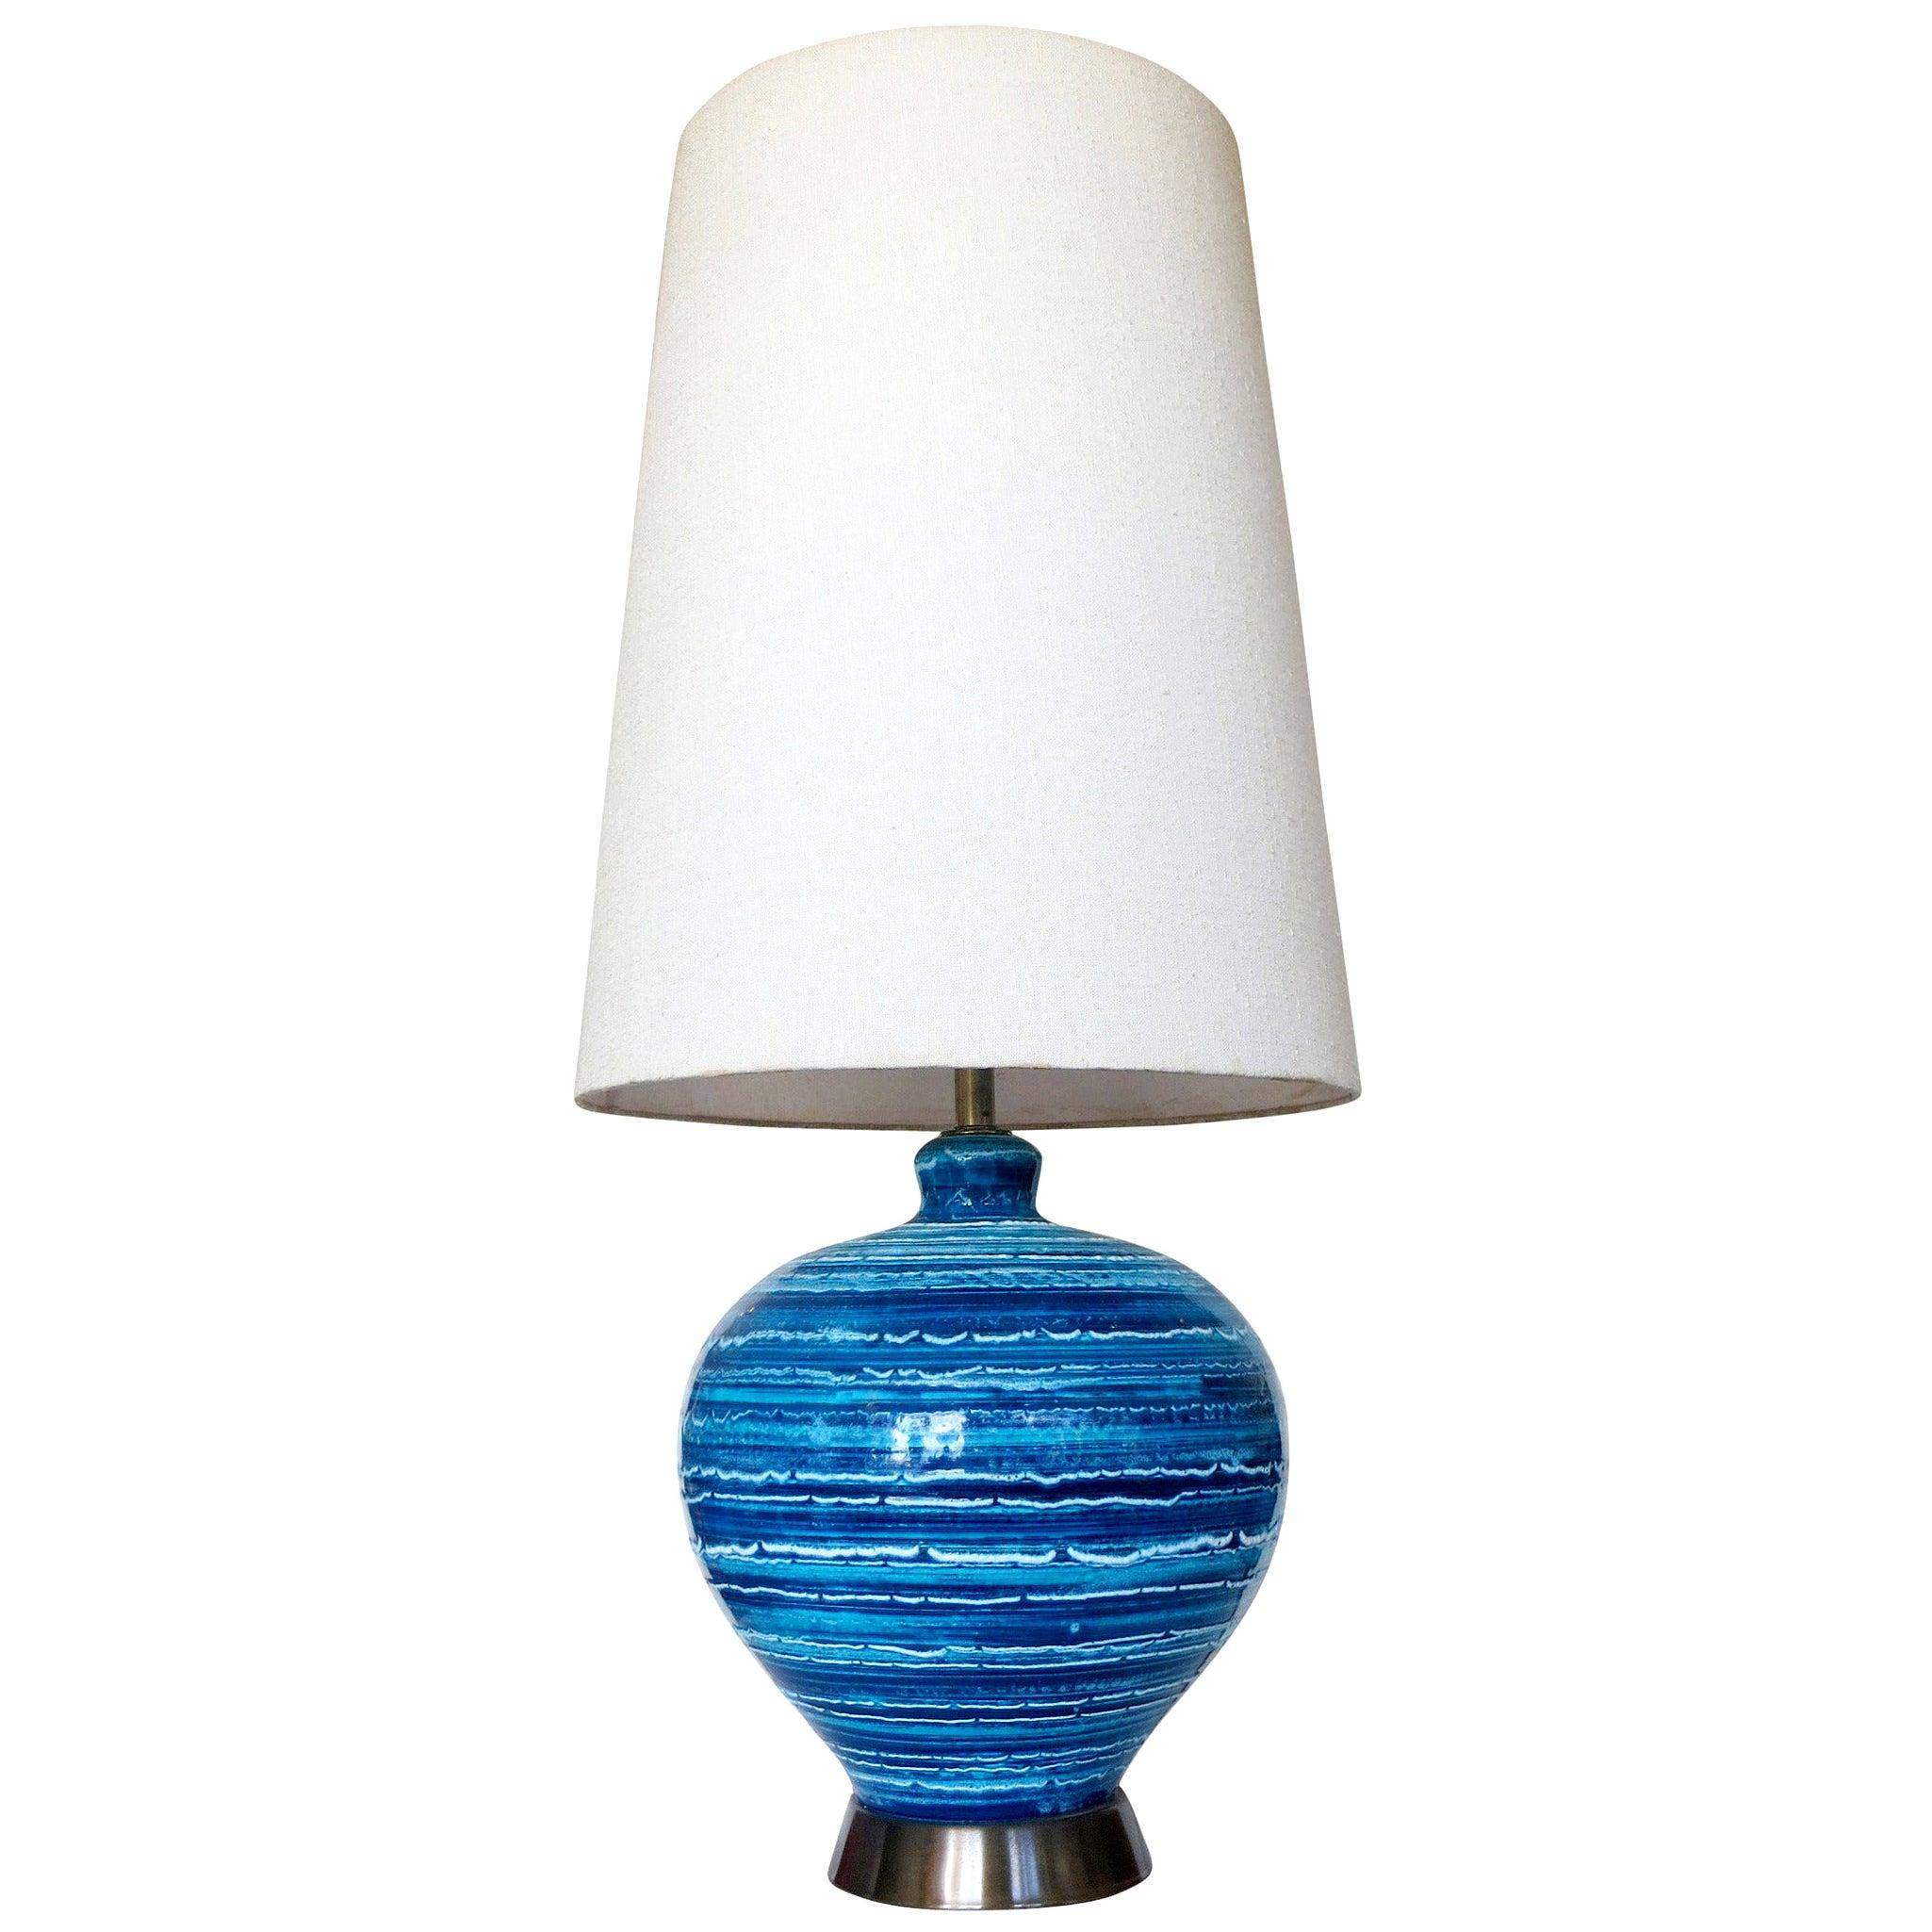 Midcentury Variegated Blue Striped Glaze Ceramic Lamp